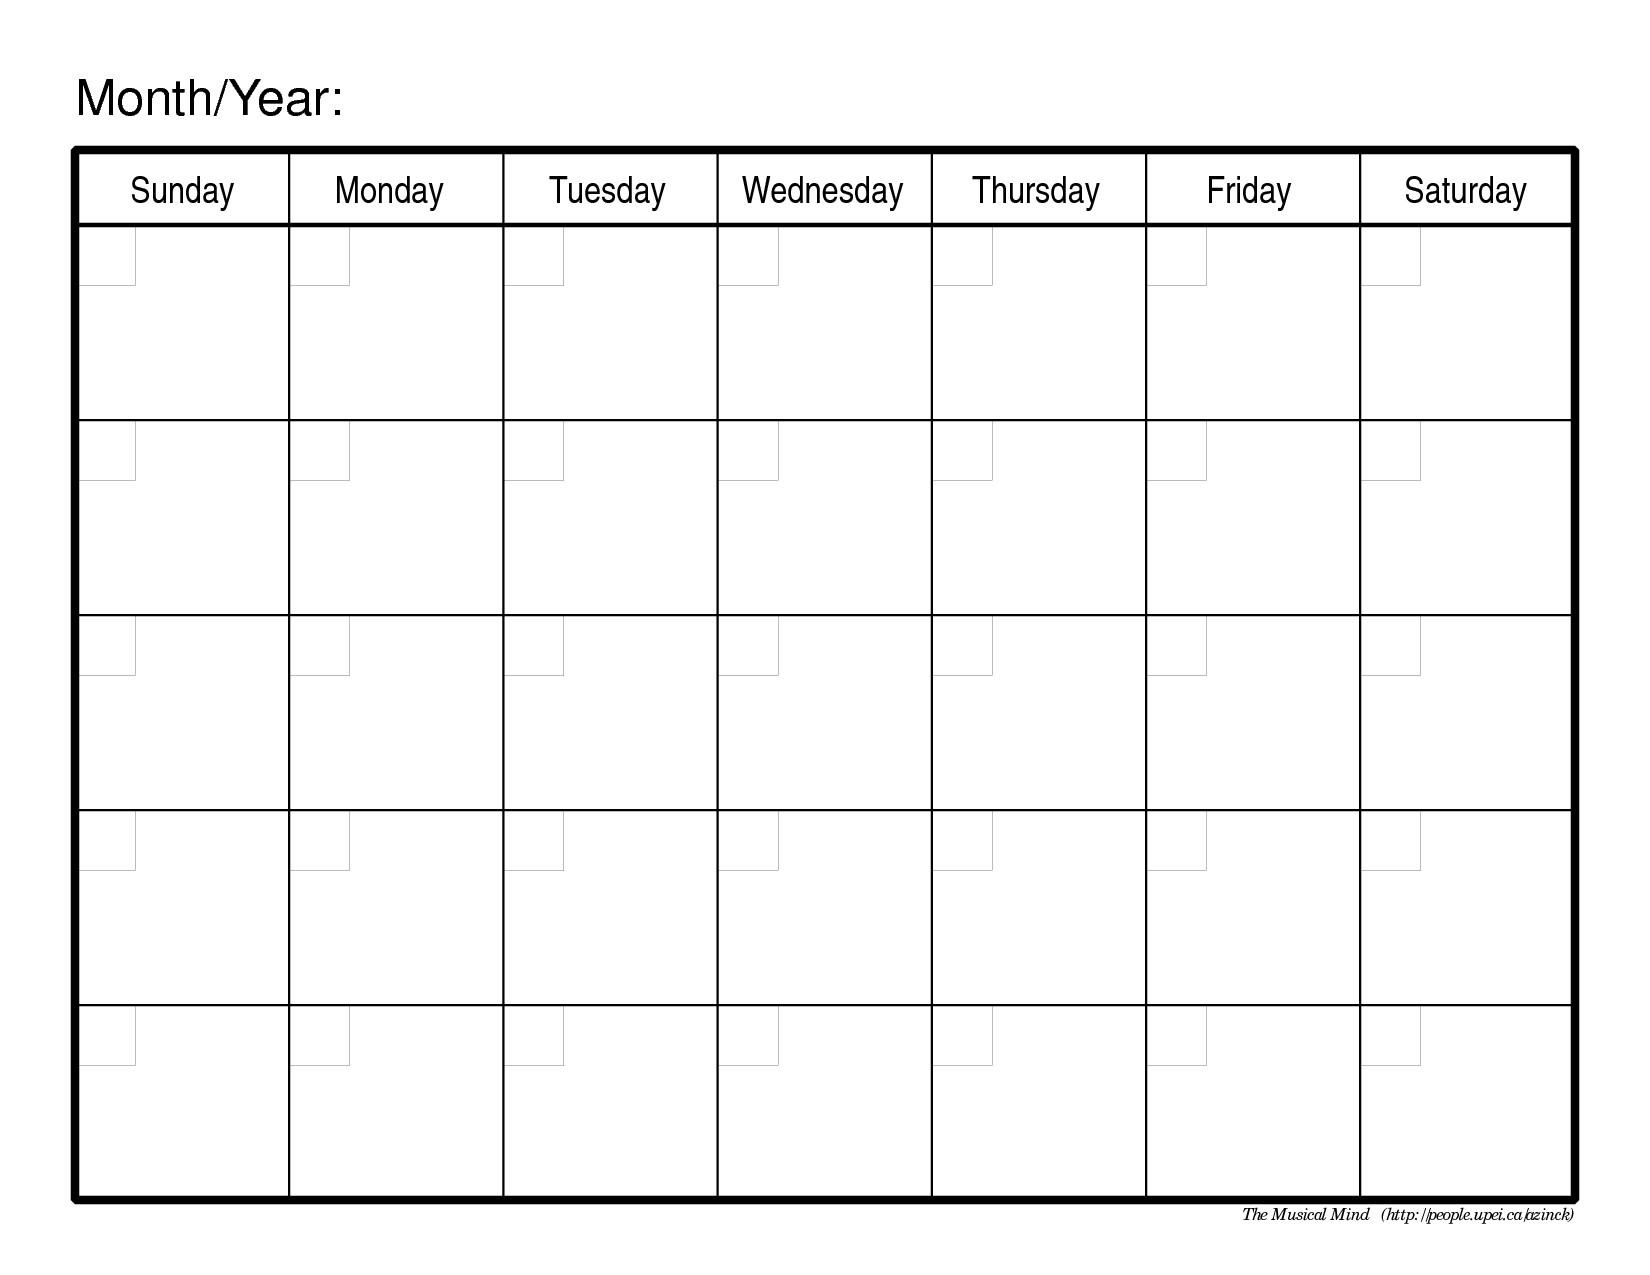 4 Week Calendar Blank Printable For No Charge - Calendaro.download